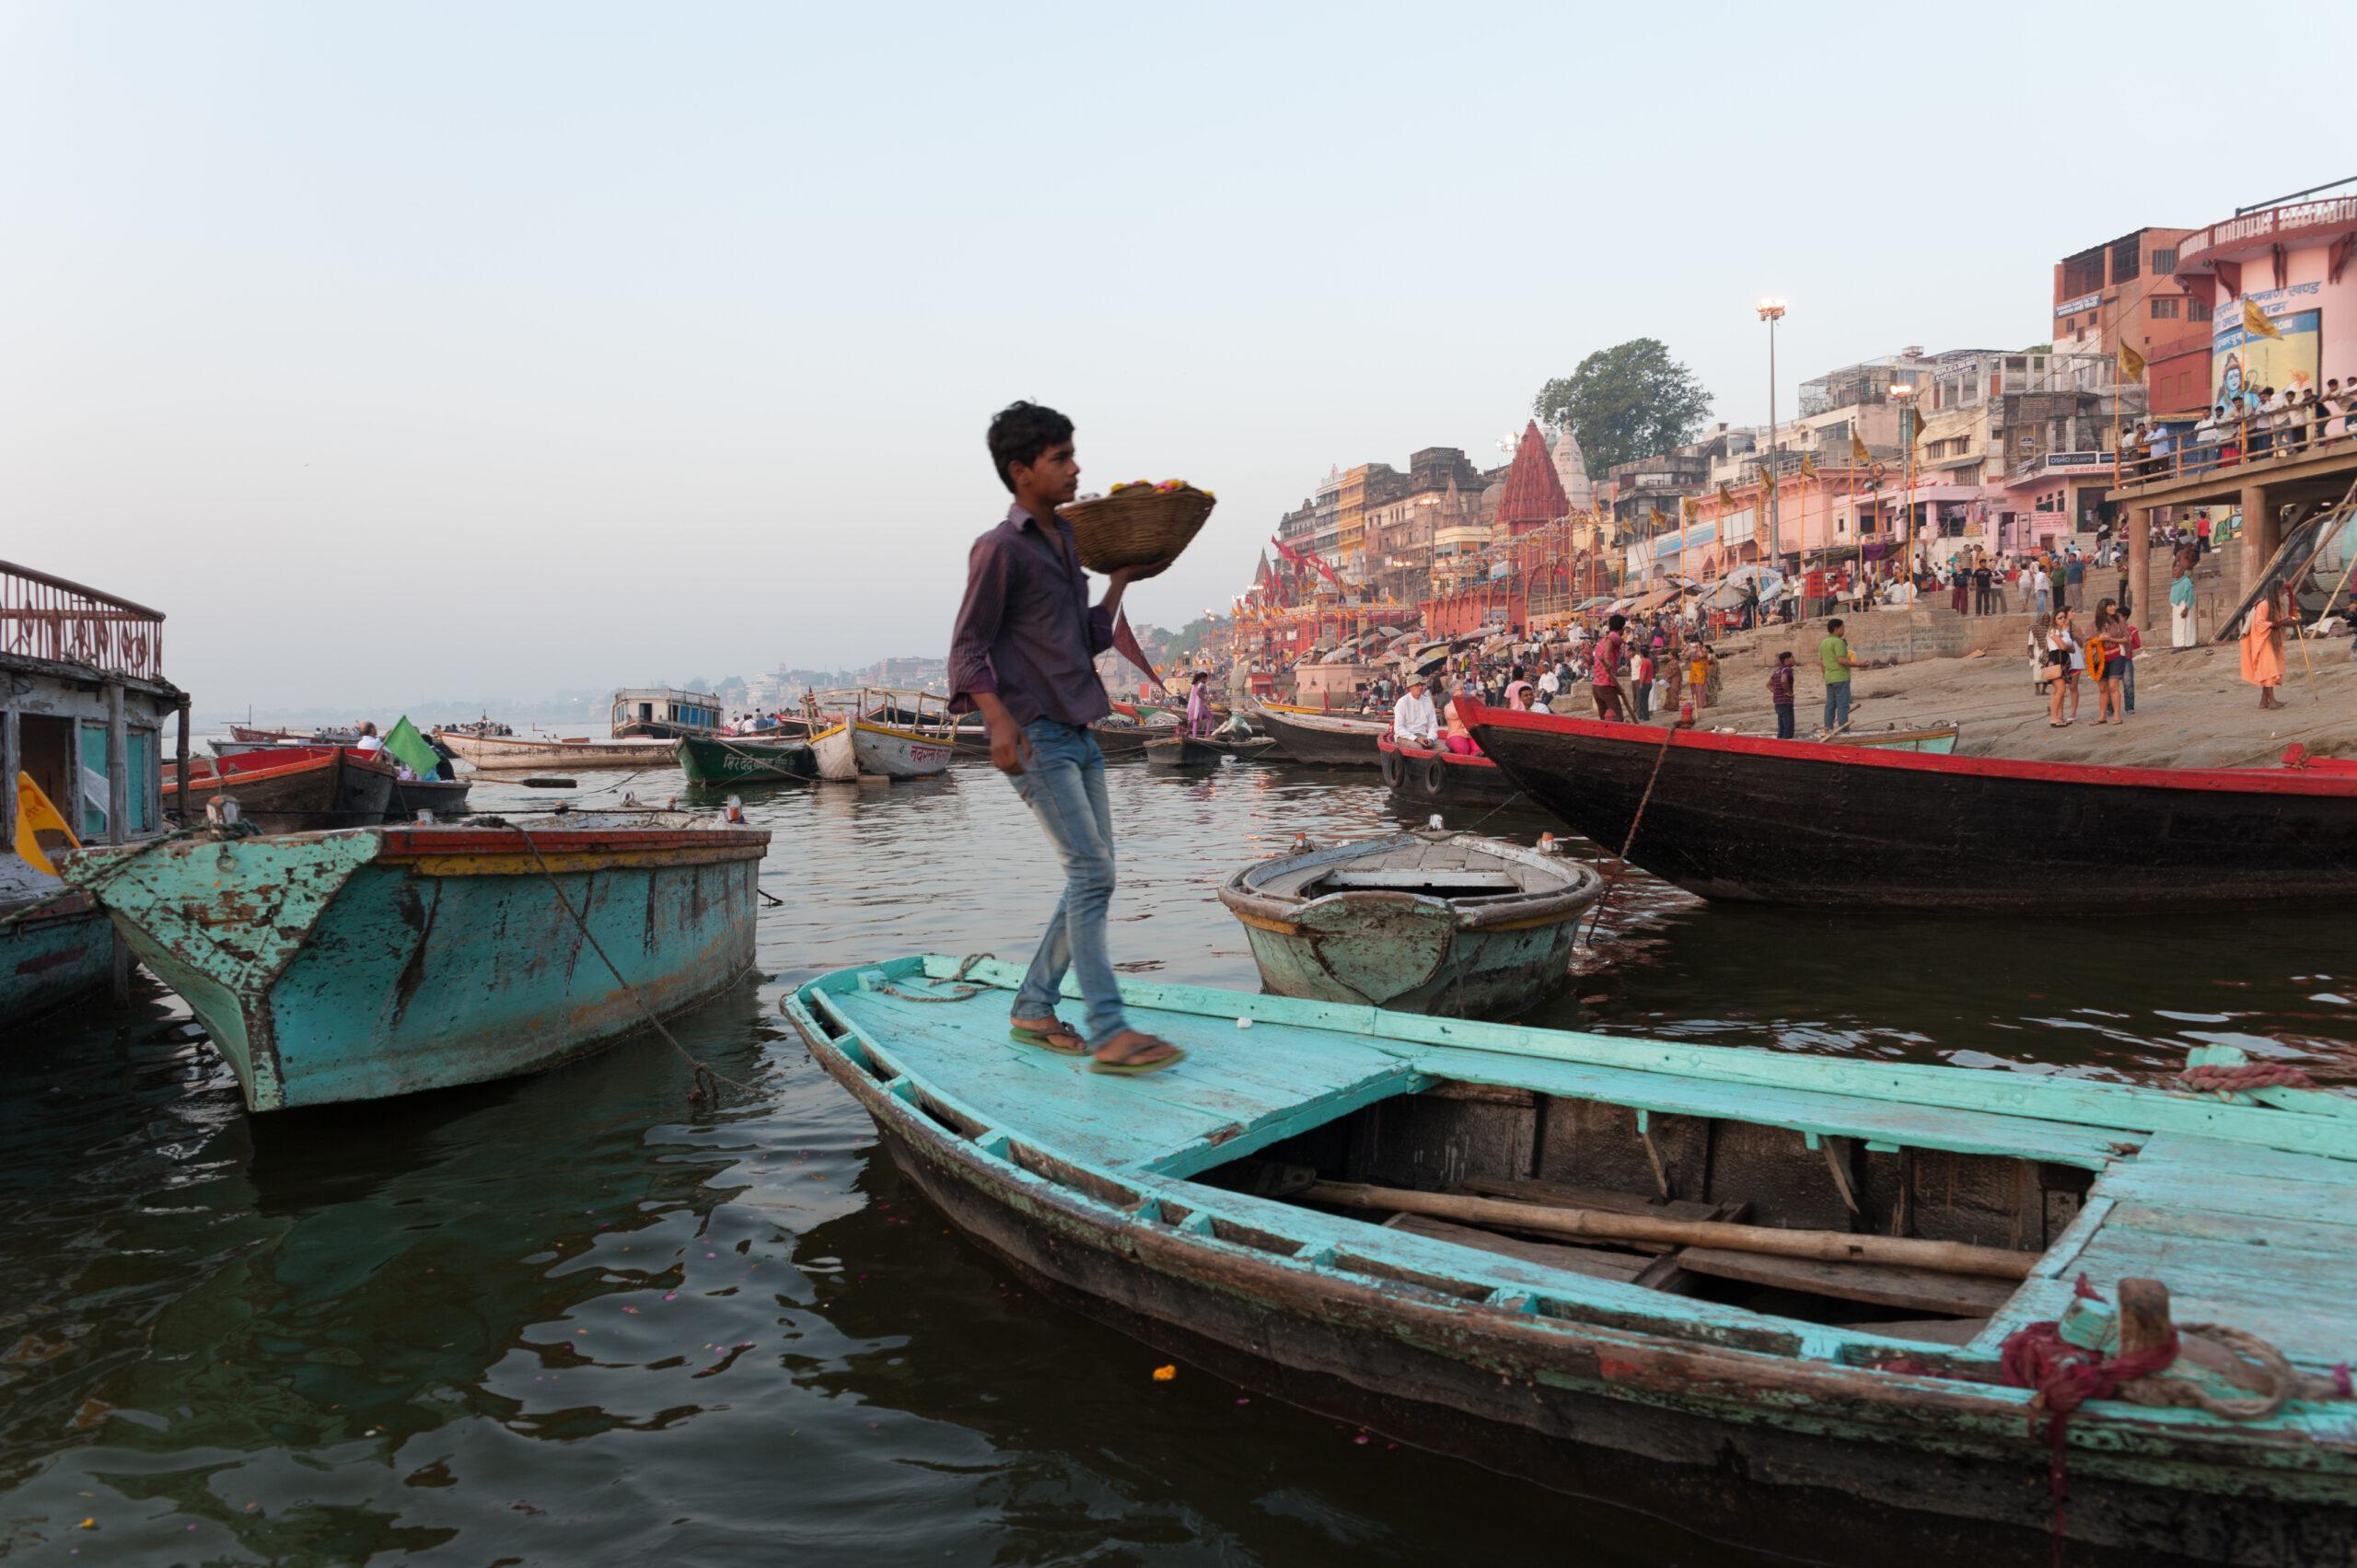 2012-04-IN-23-Morgens auf dem Ganges